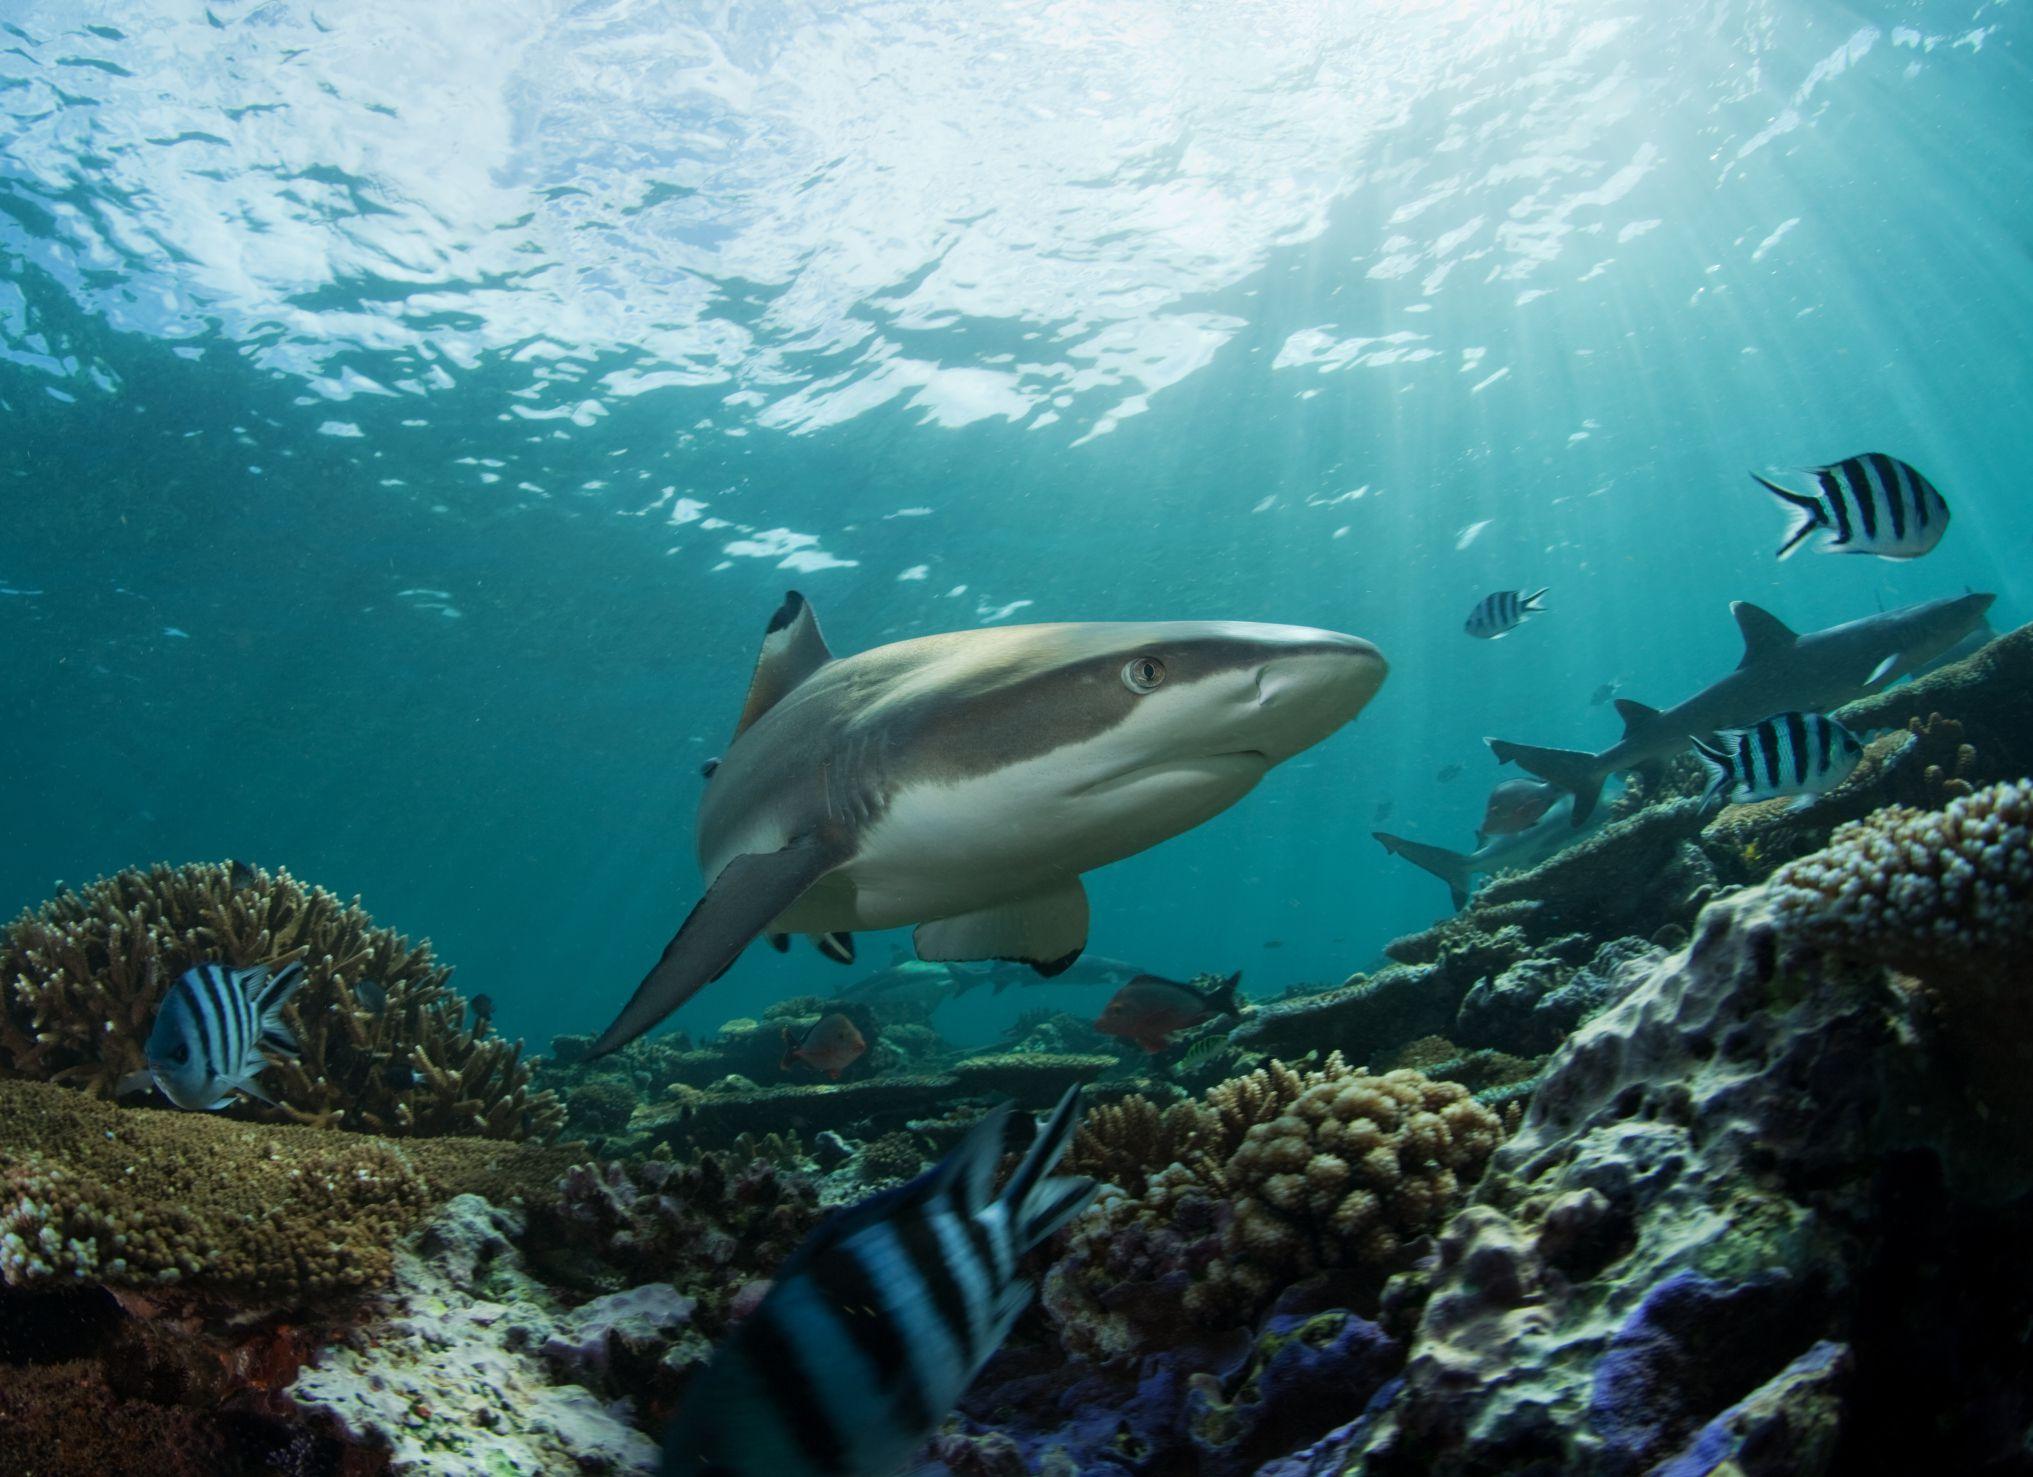 Ecosistemul Mării Negre | Itinerarii pontice